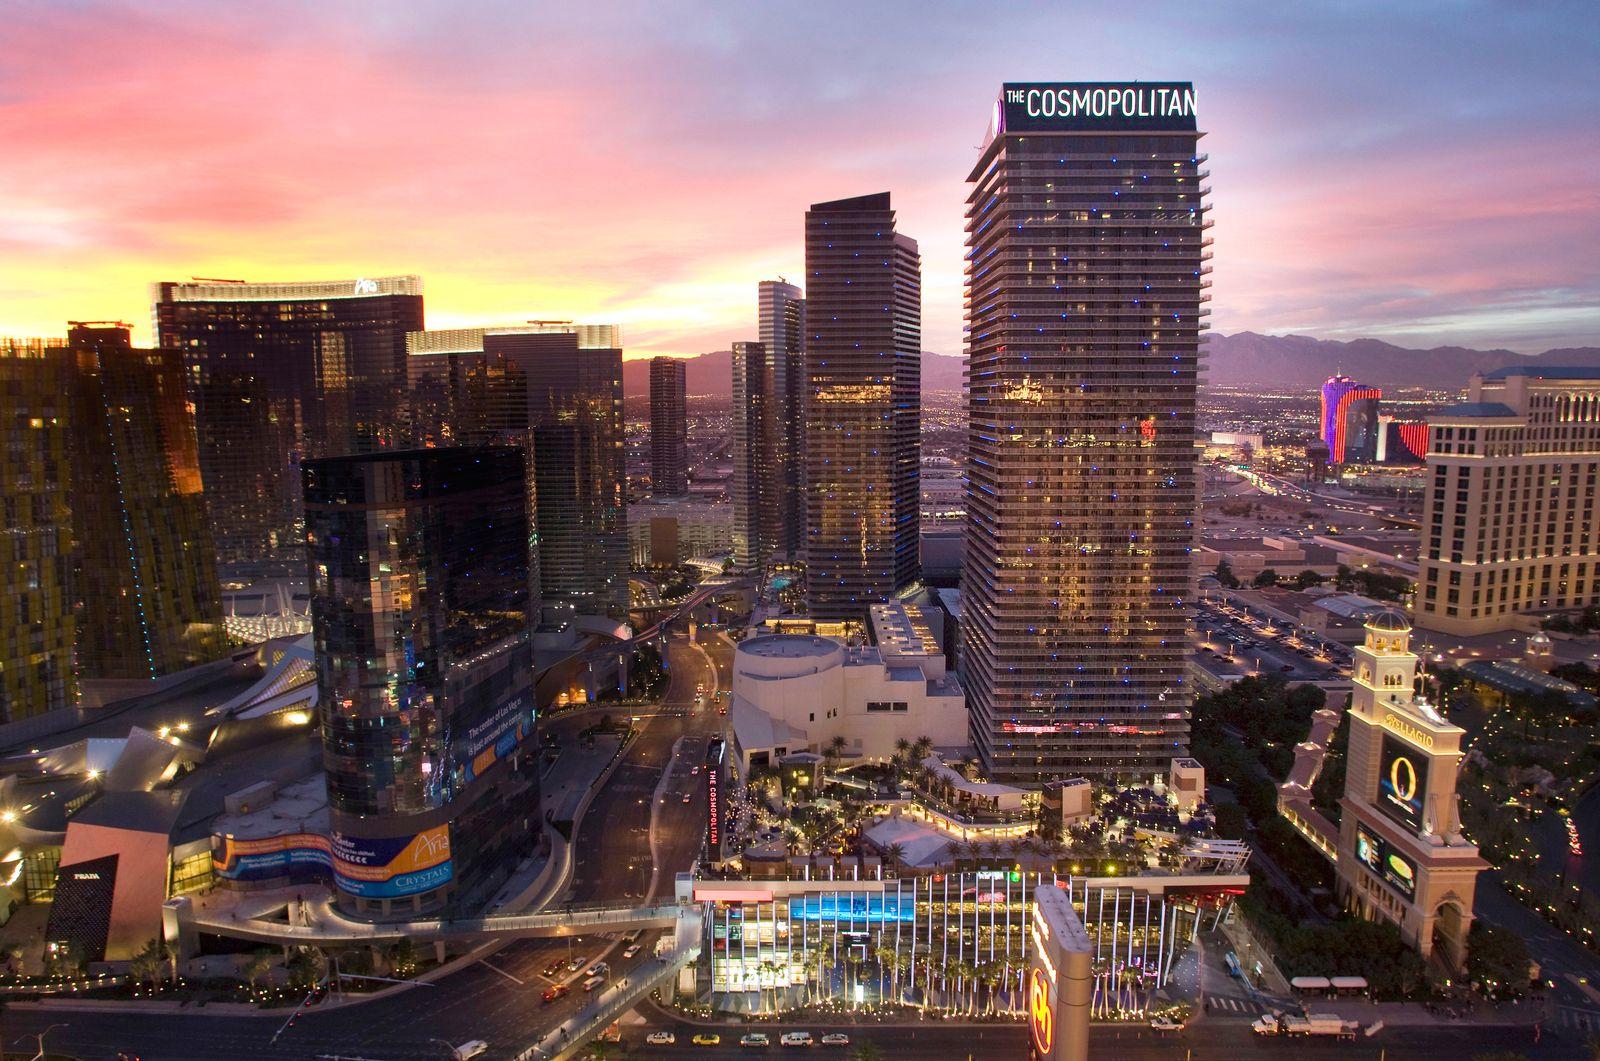 Cosmopolitan of Las Vegas / Deutsche Bank Casino